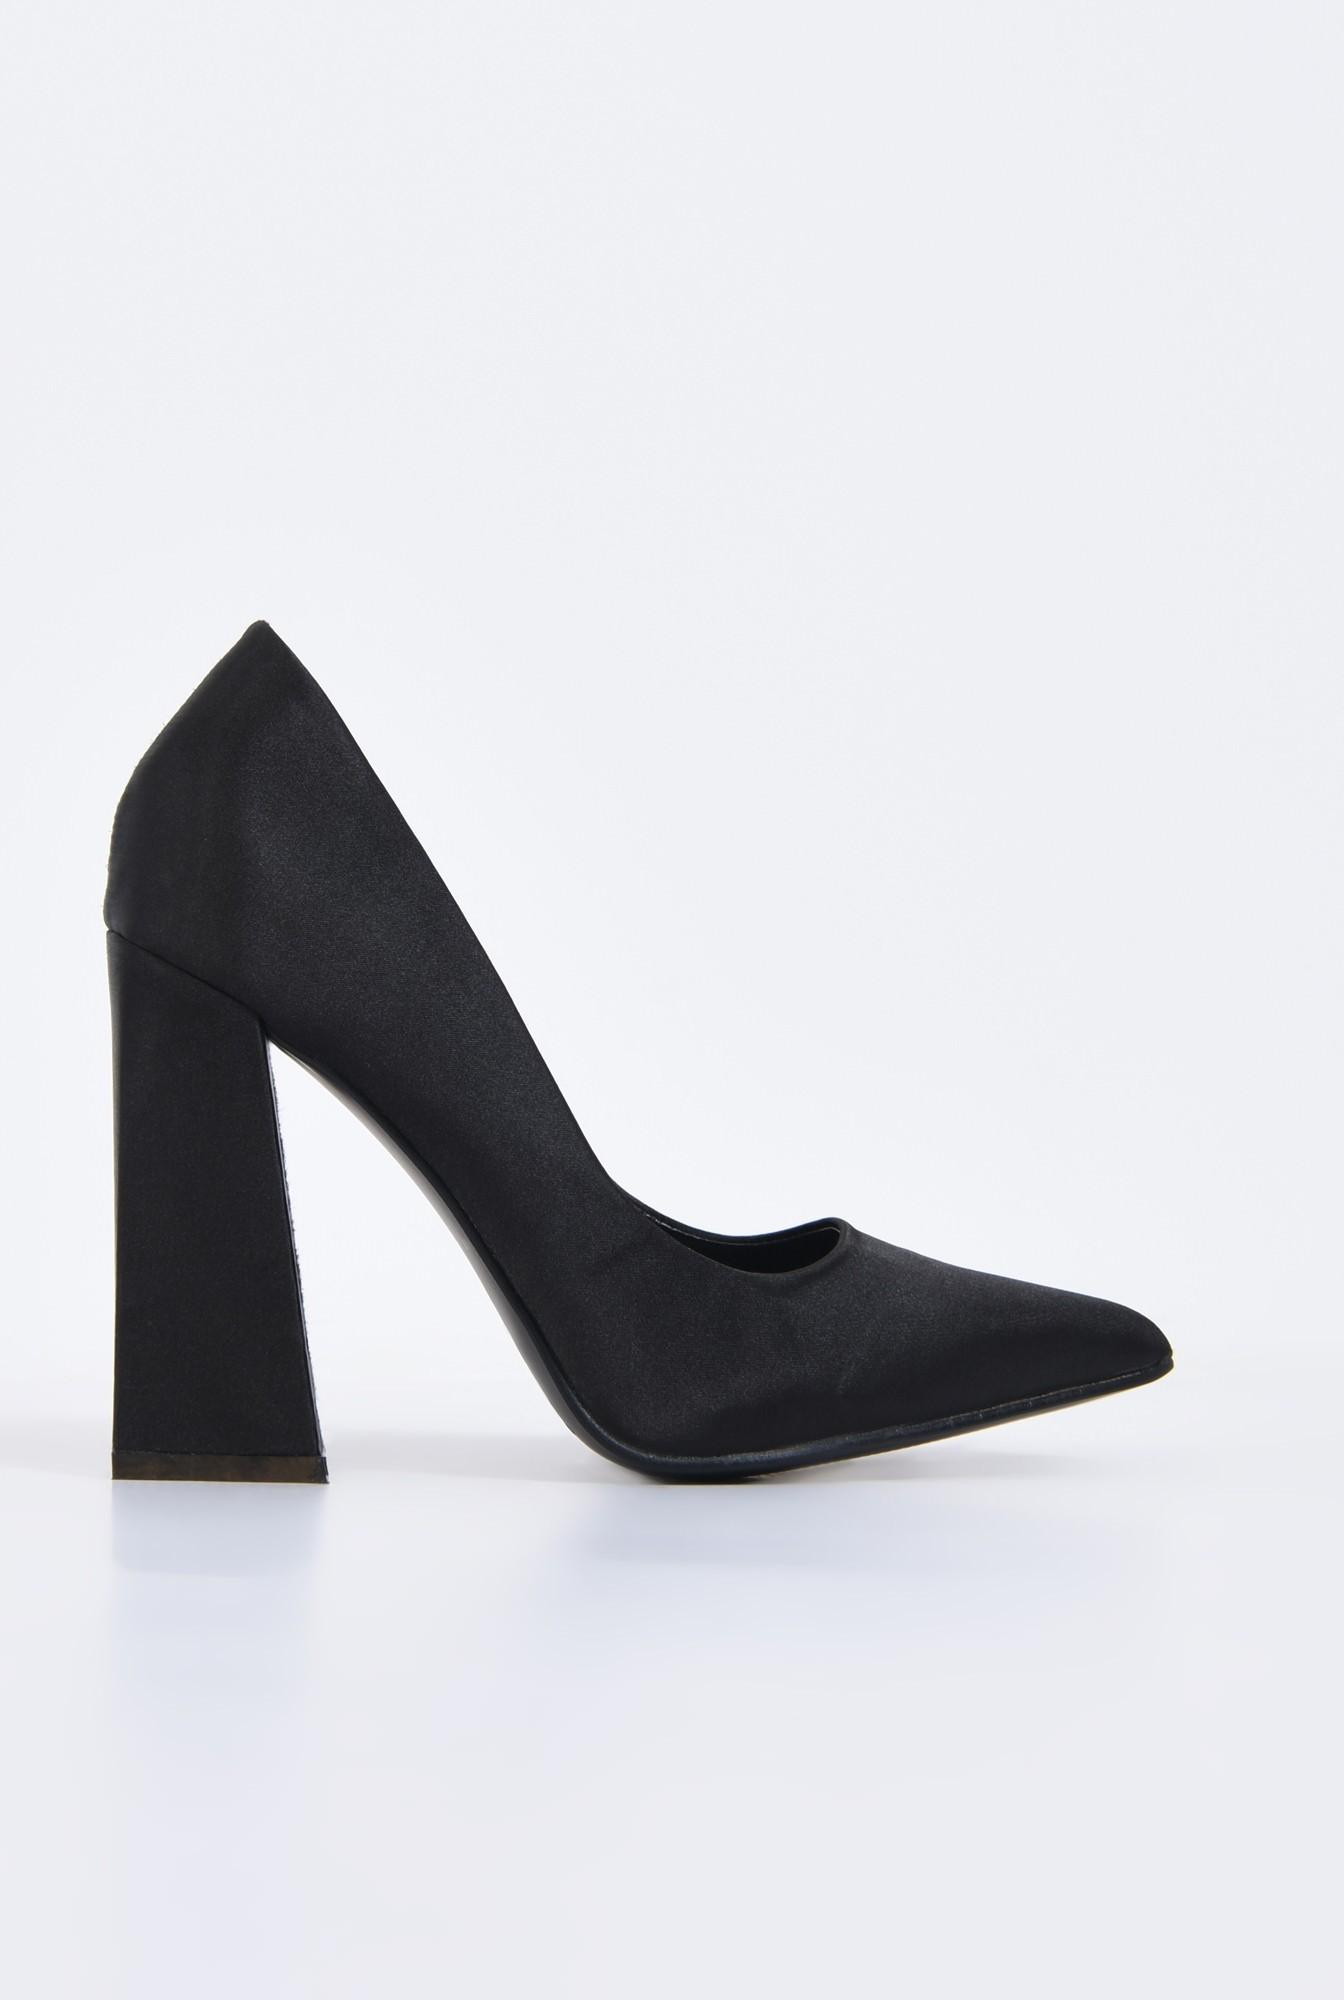 0 - pantofi eleganti, negri, satin, toc inalt